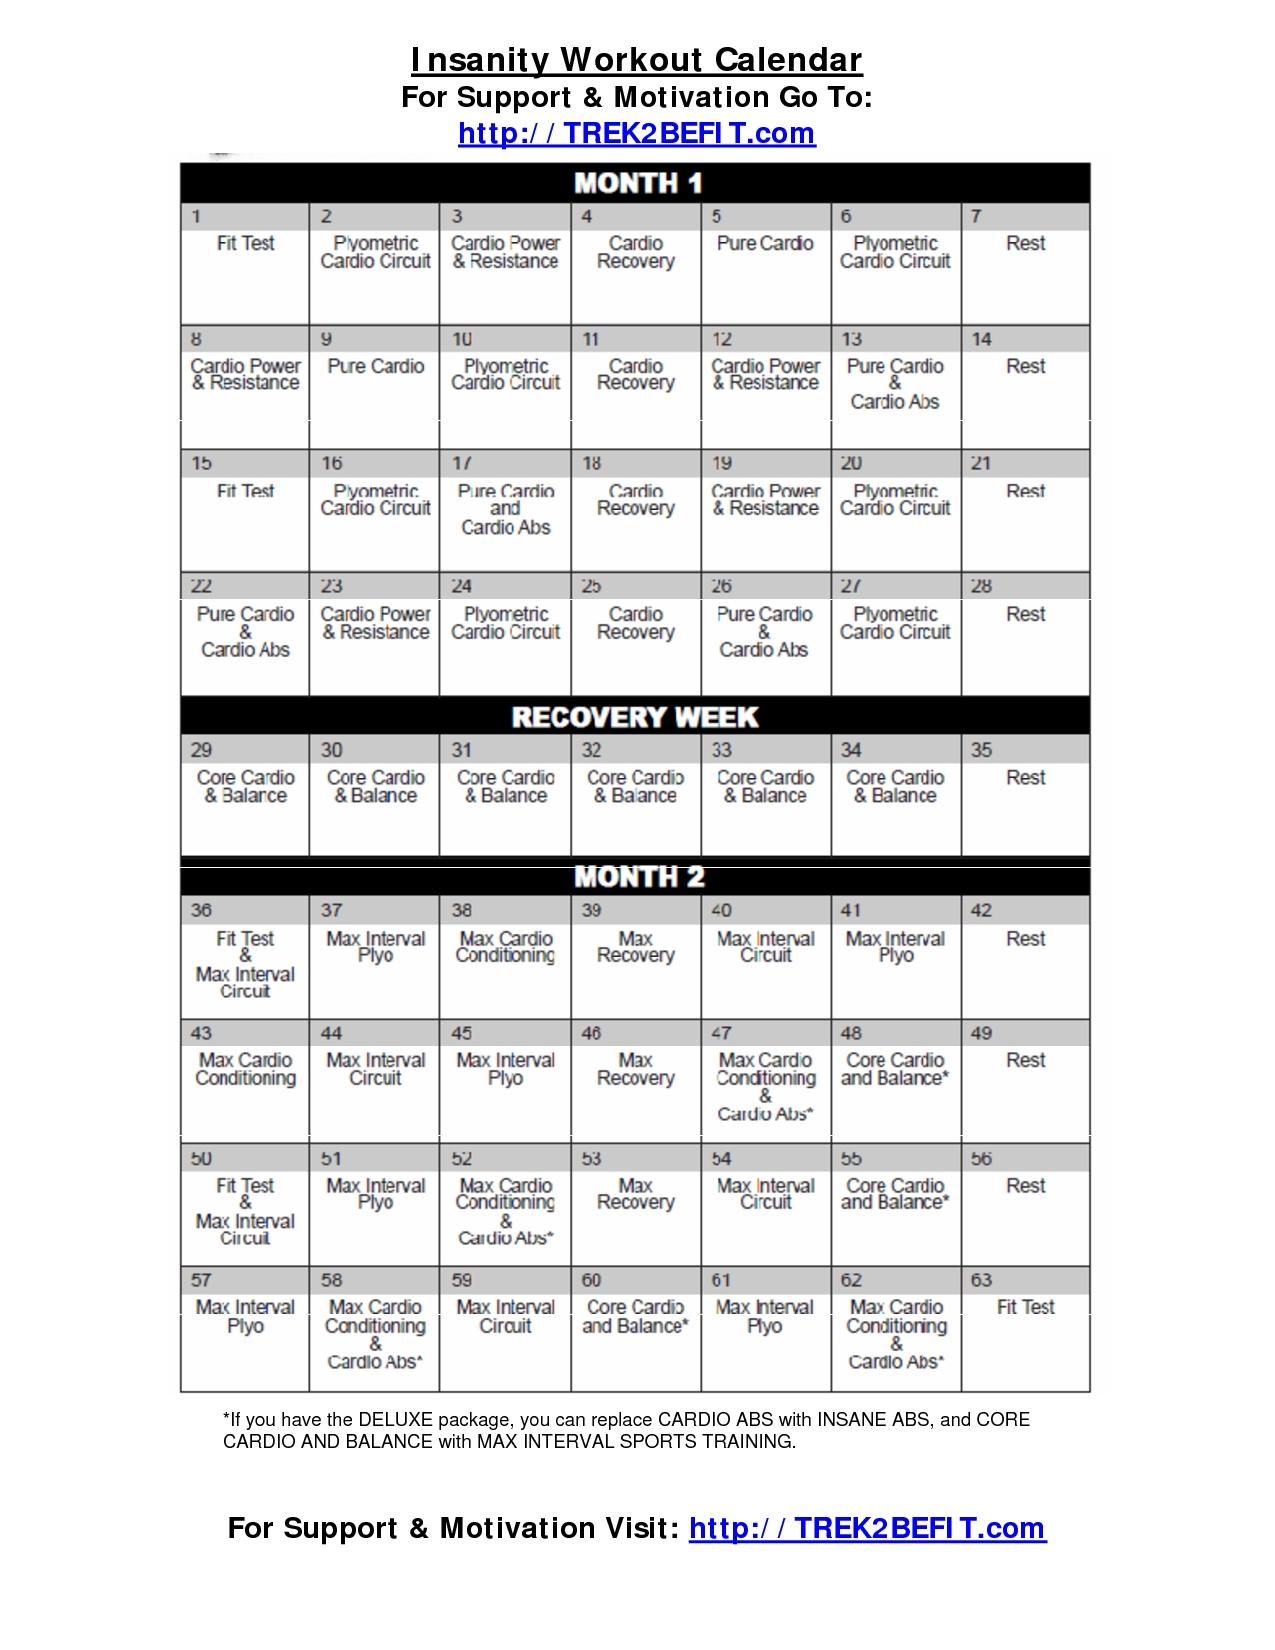 Insanity Workout Calendar | Workout Calendar, Insanity